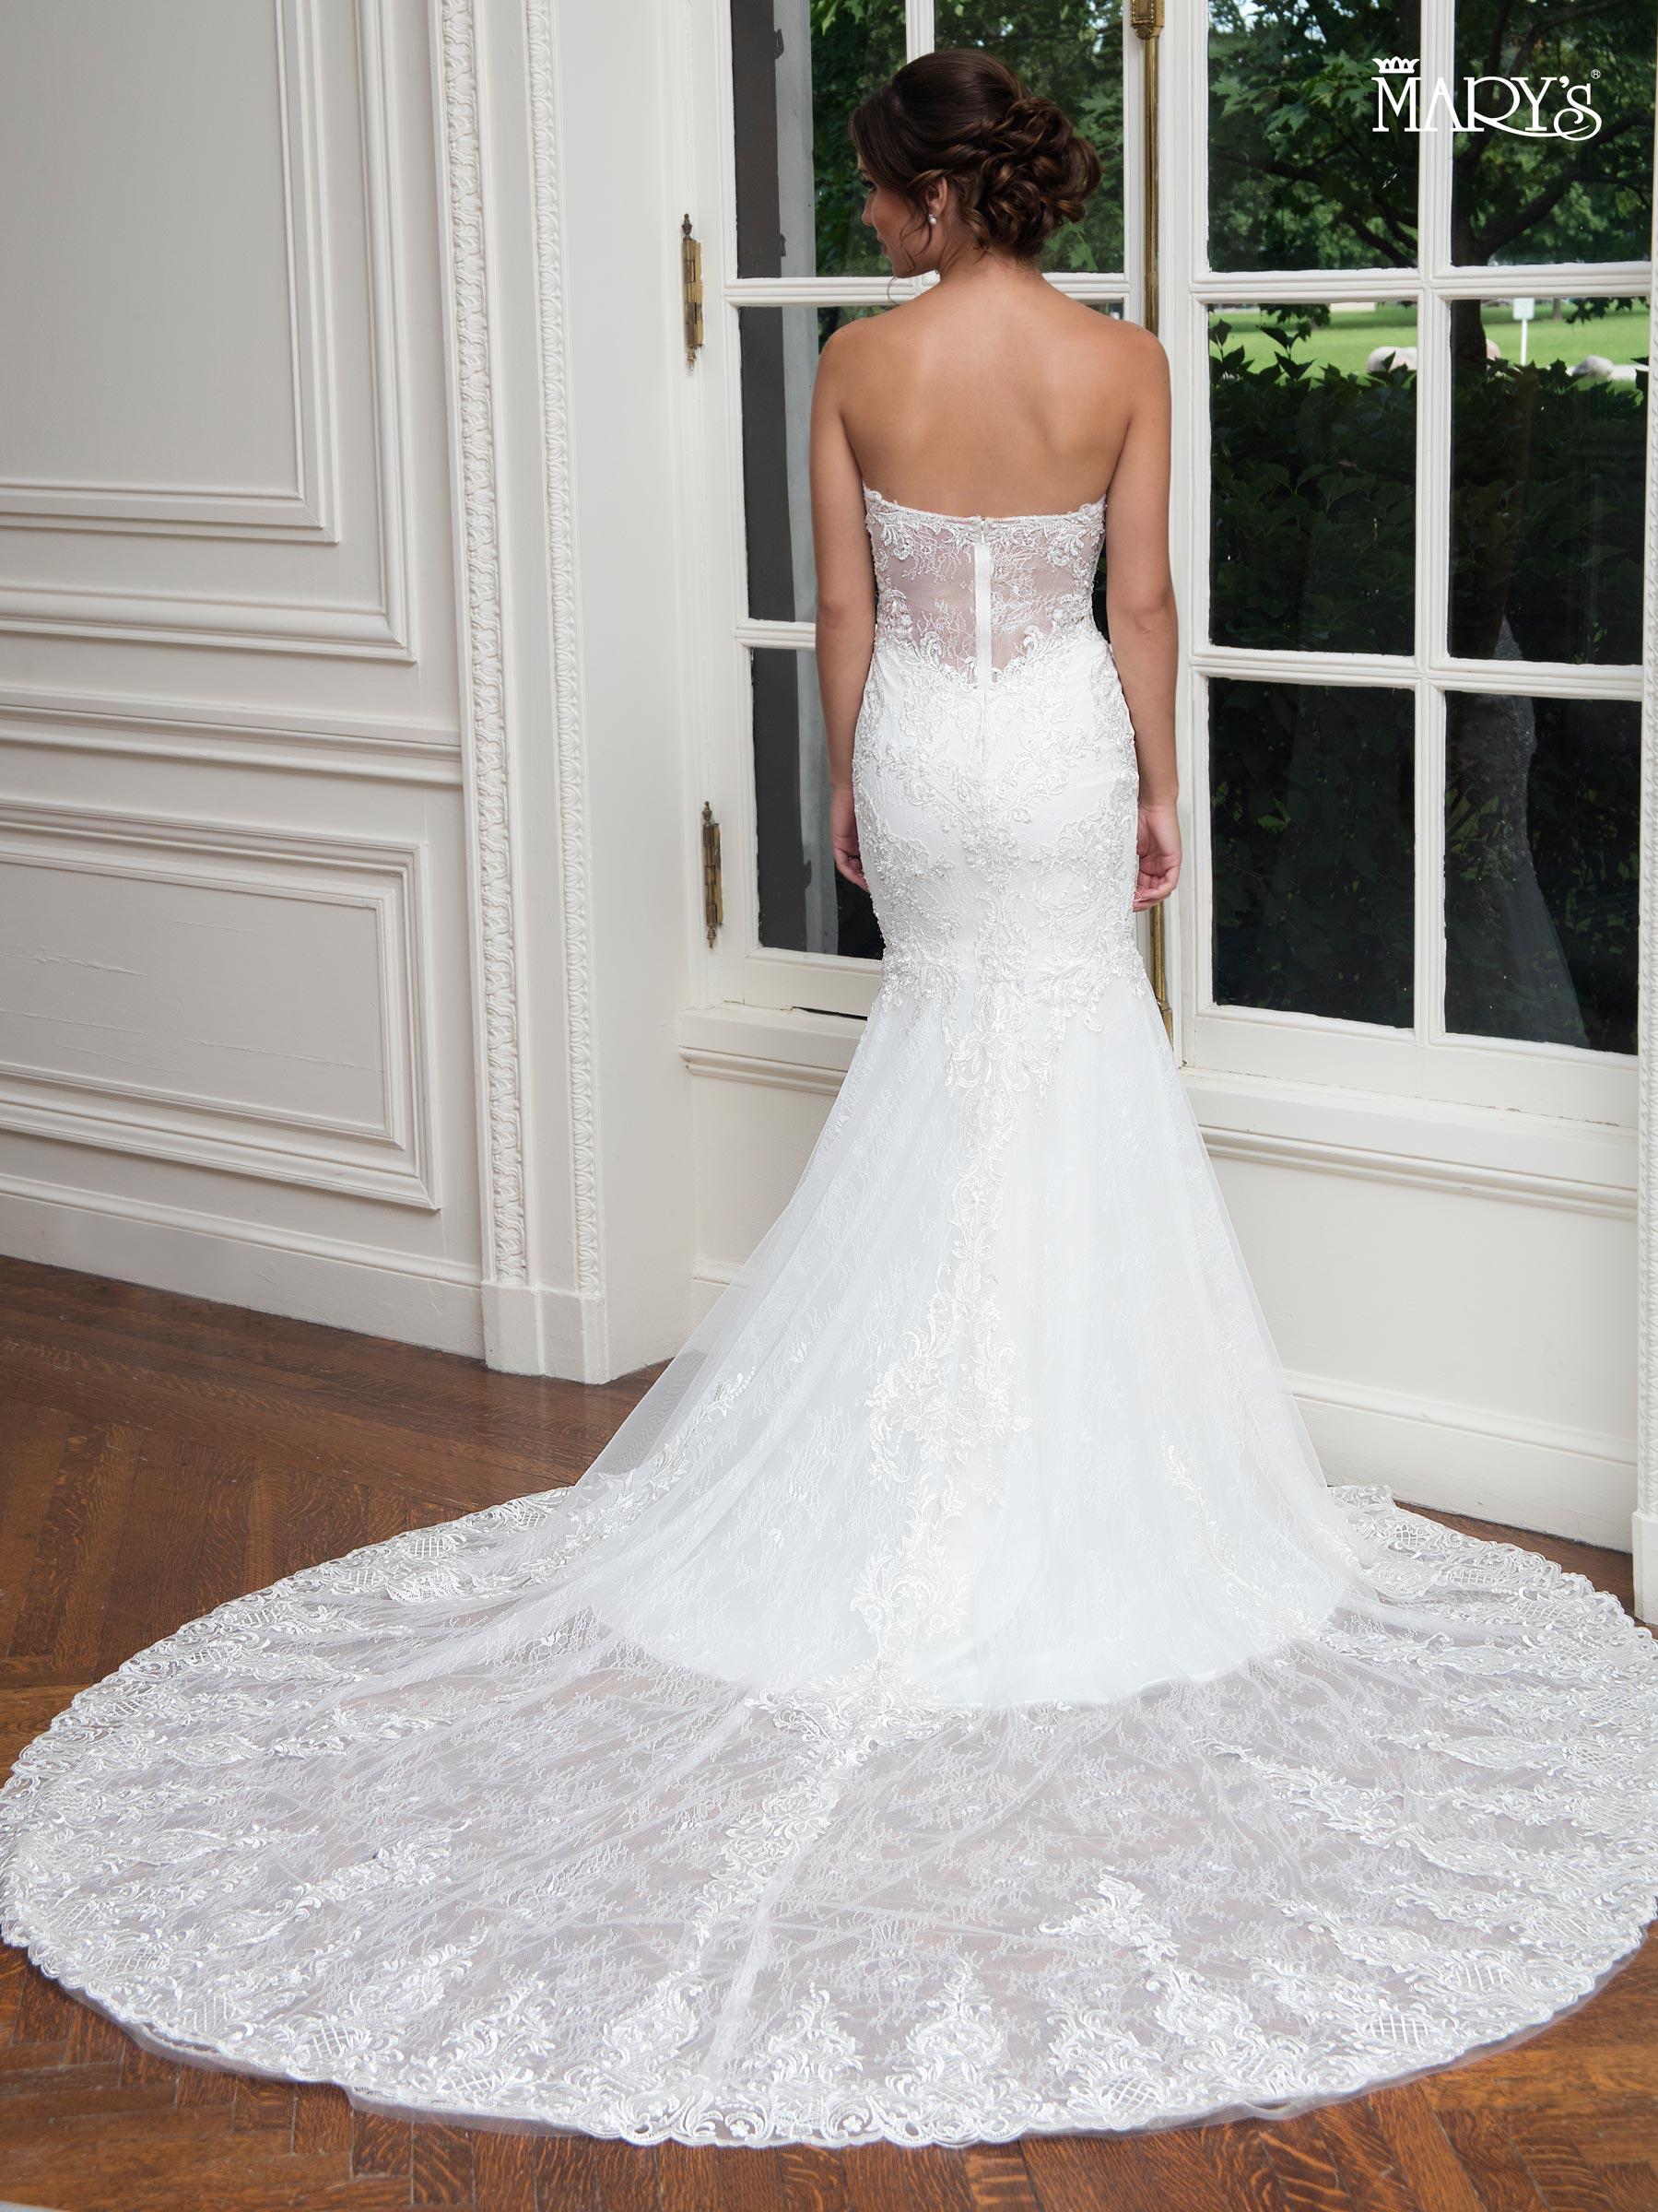 Bridal Wedding Dresses | Mary's | Style - MB3022